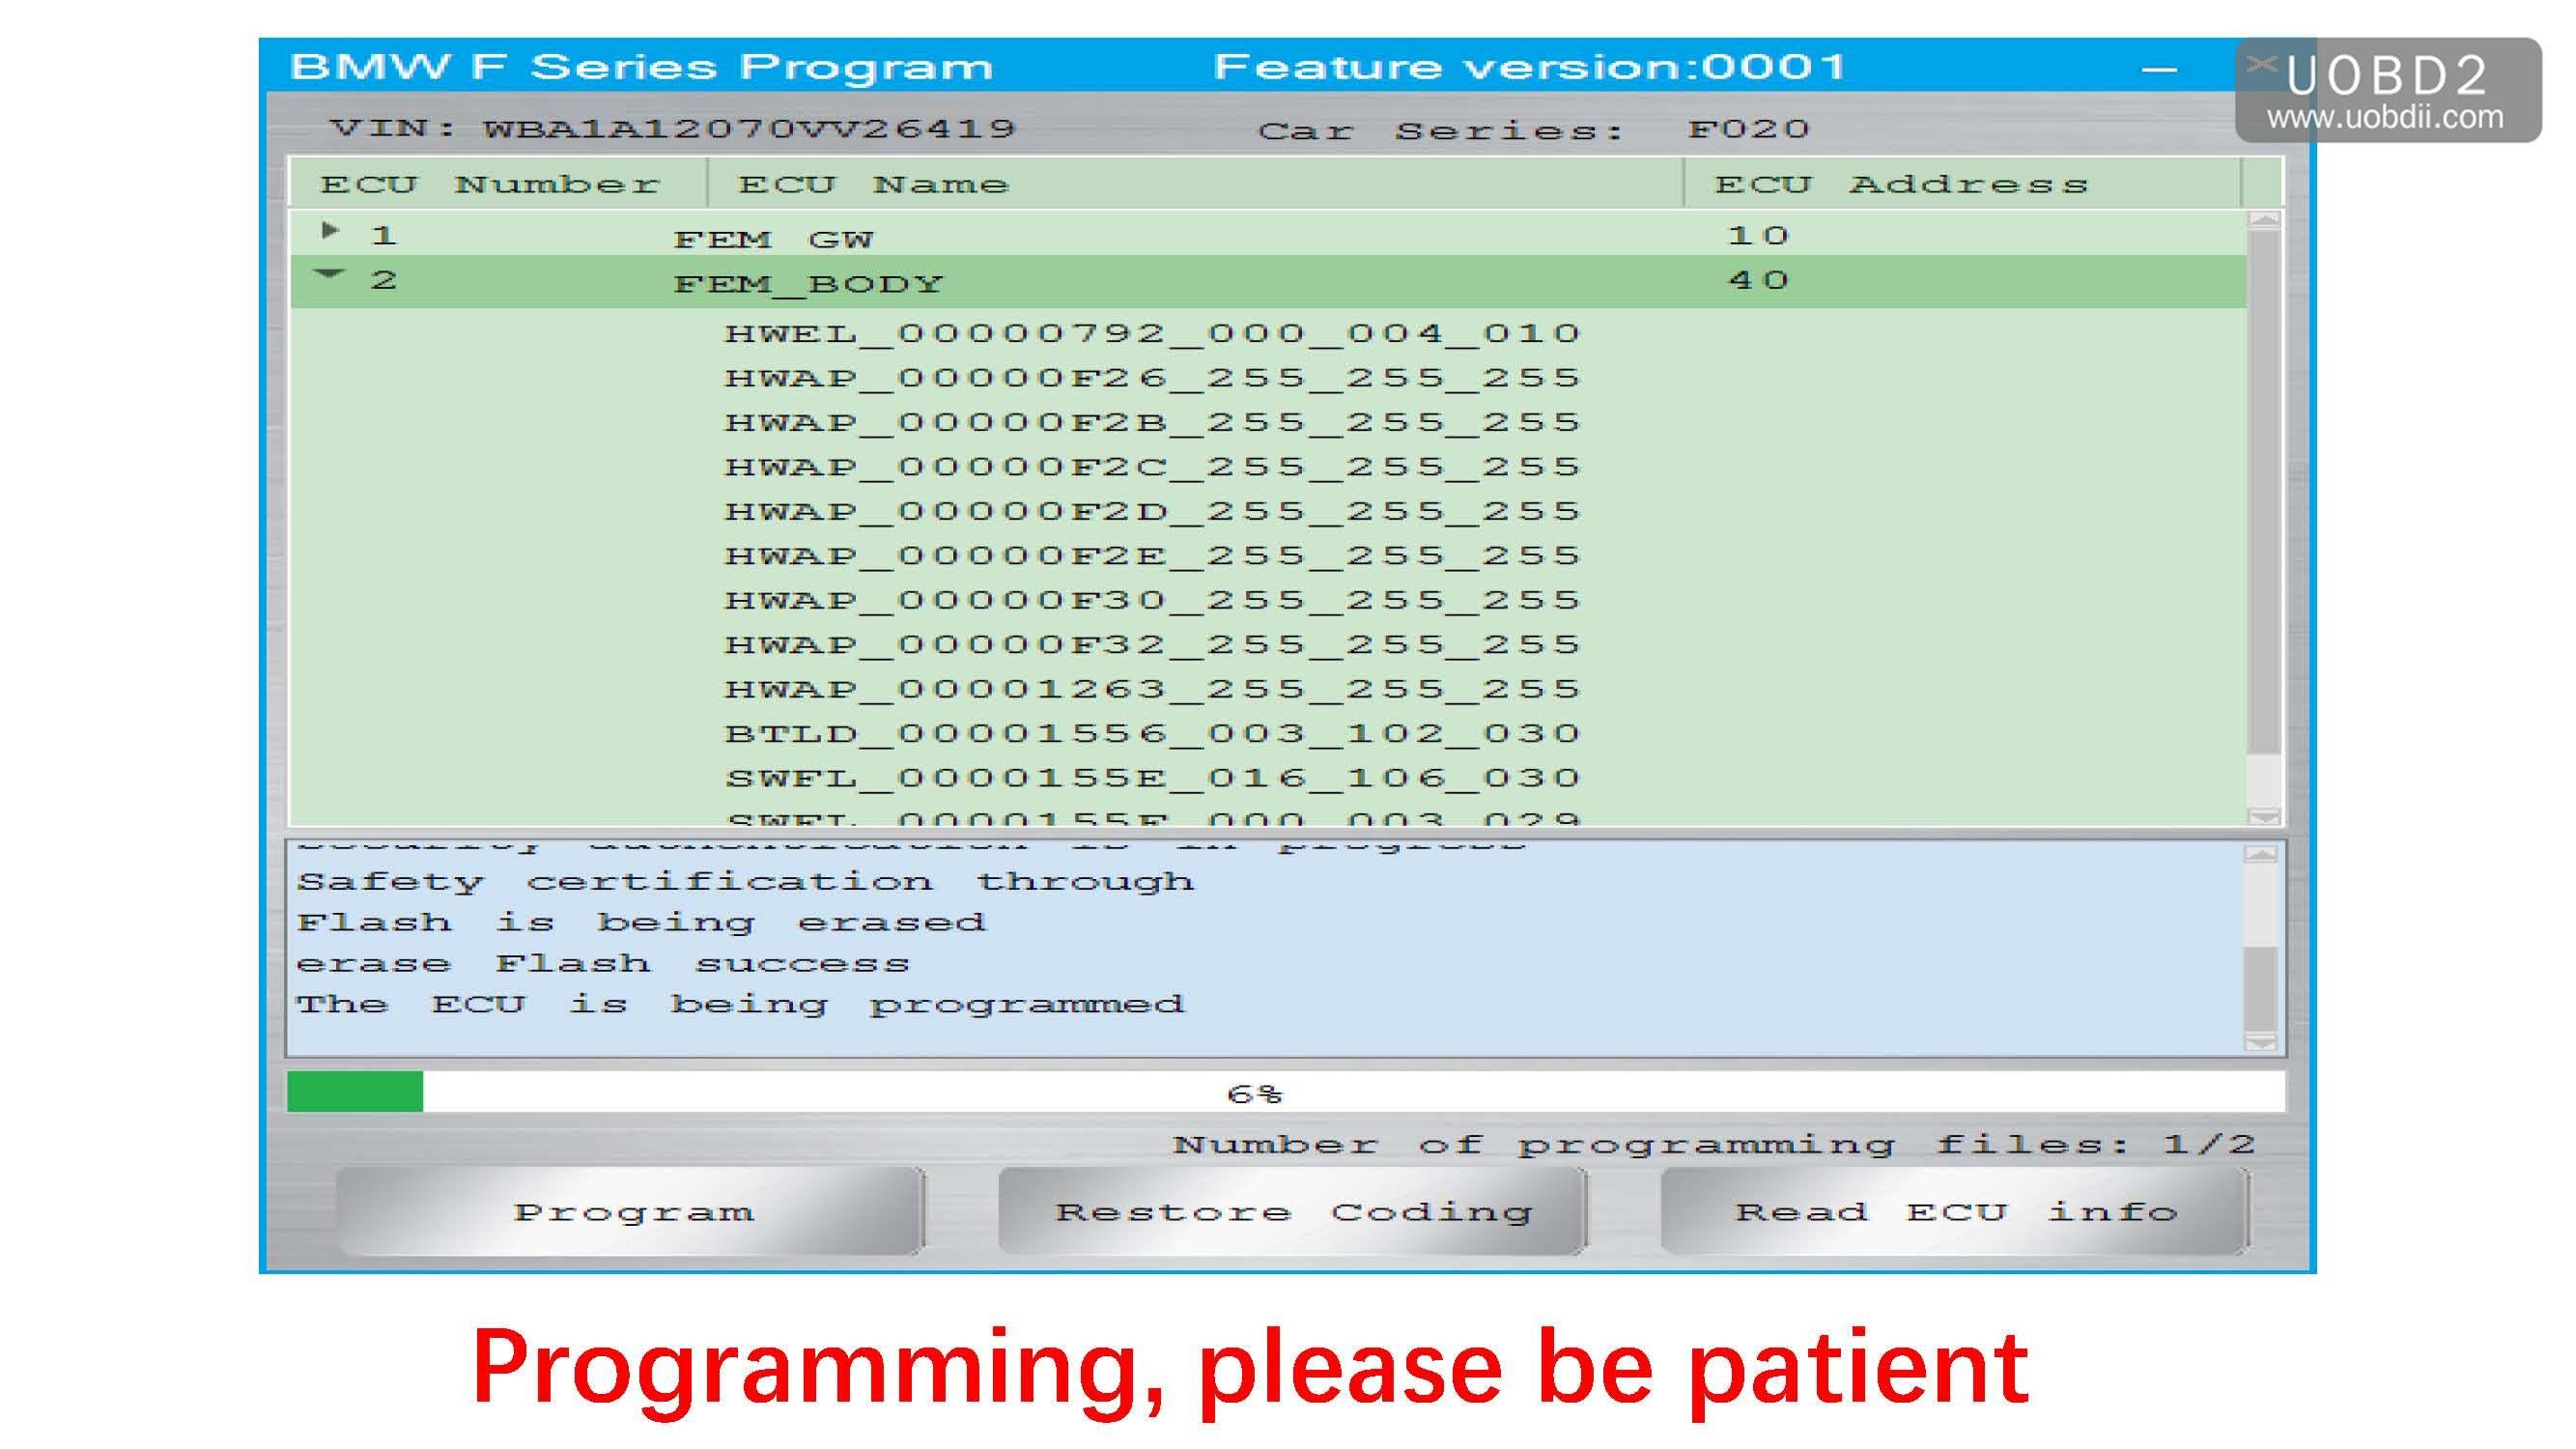 cgdi-pro-bmw-f-series-program-06